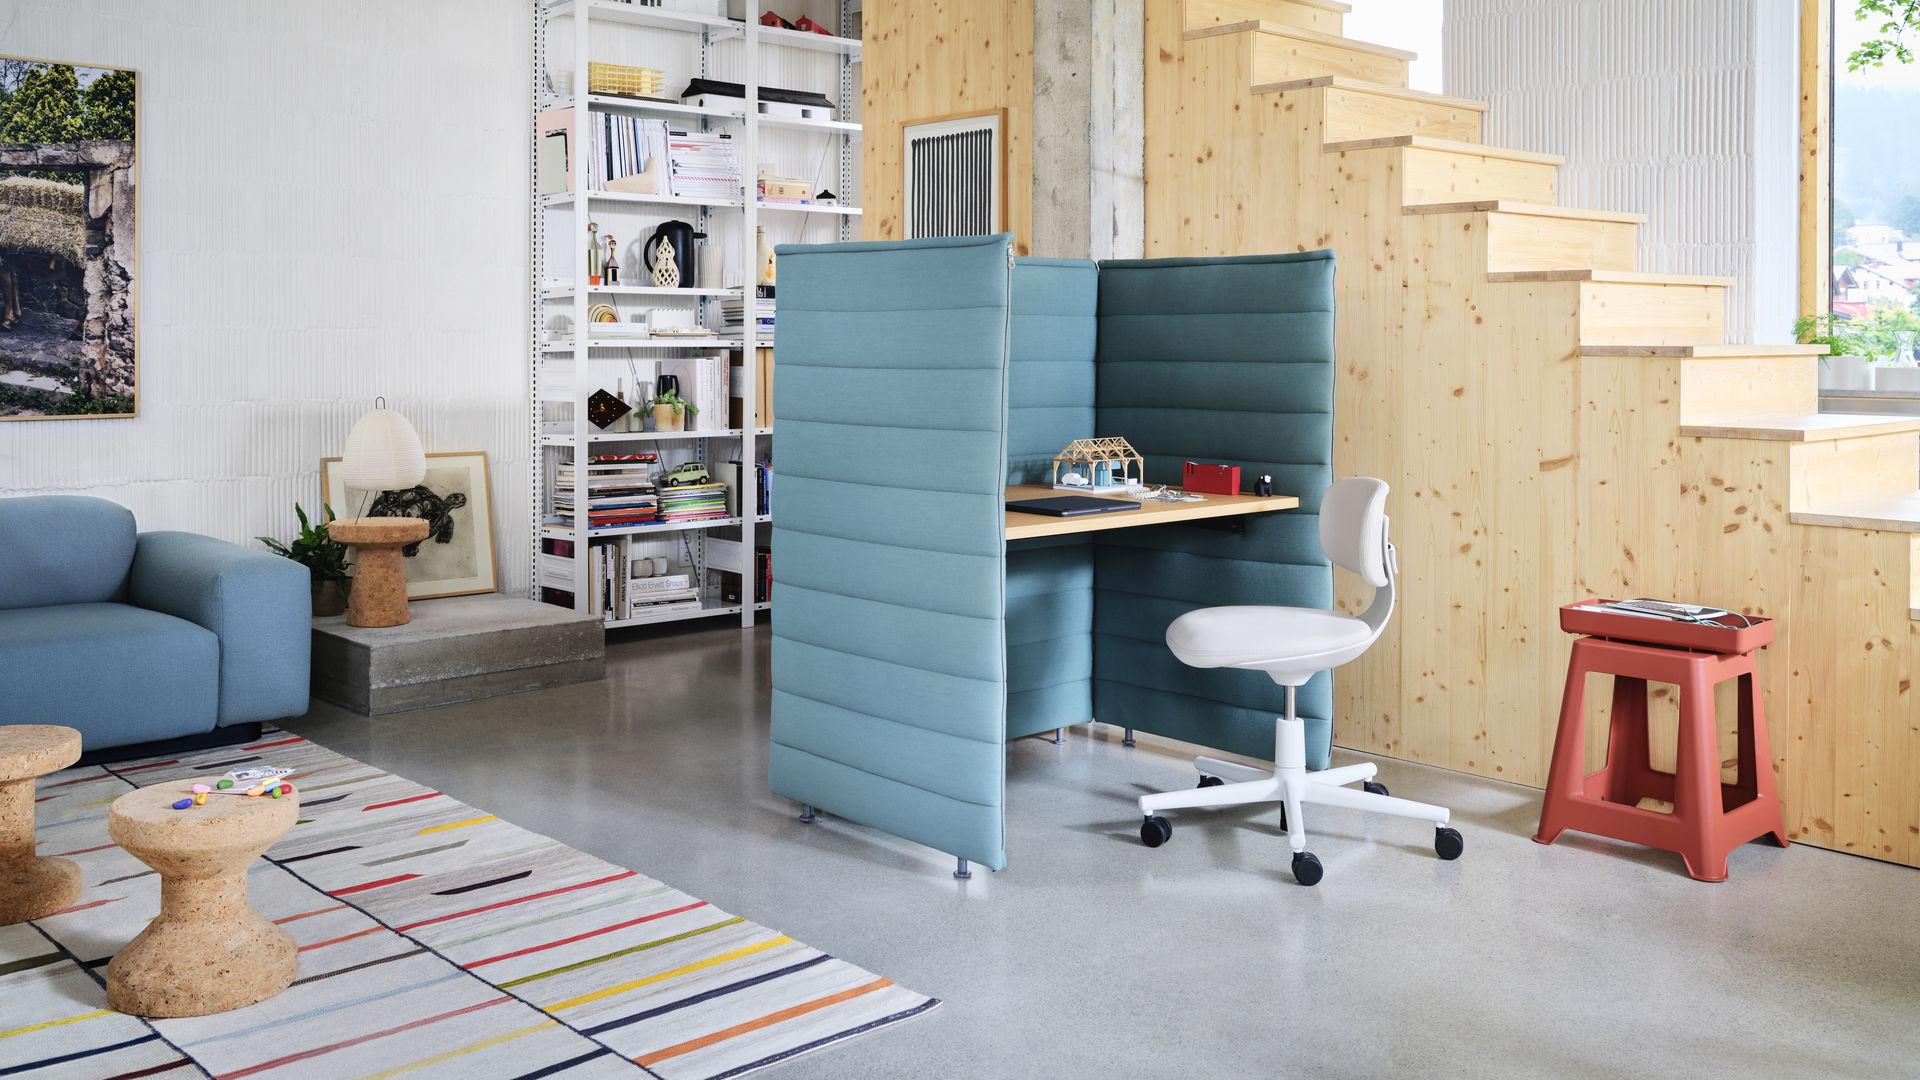 Alcove Plus Desk Rookie Chap Chap Tray Soft Modular Sofa Cork Family_web_16-9